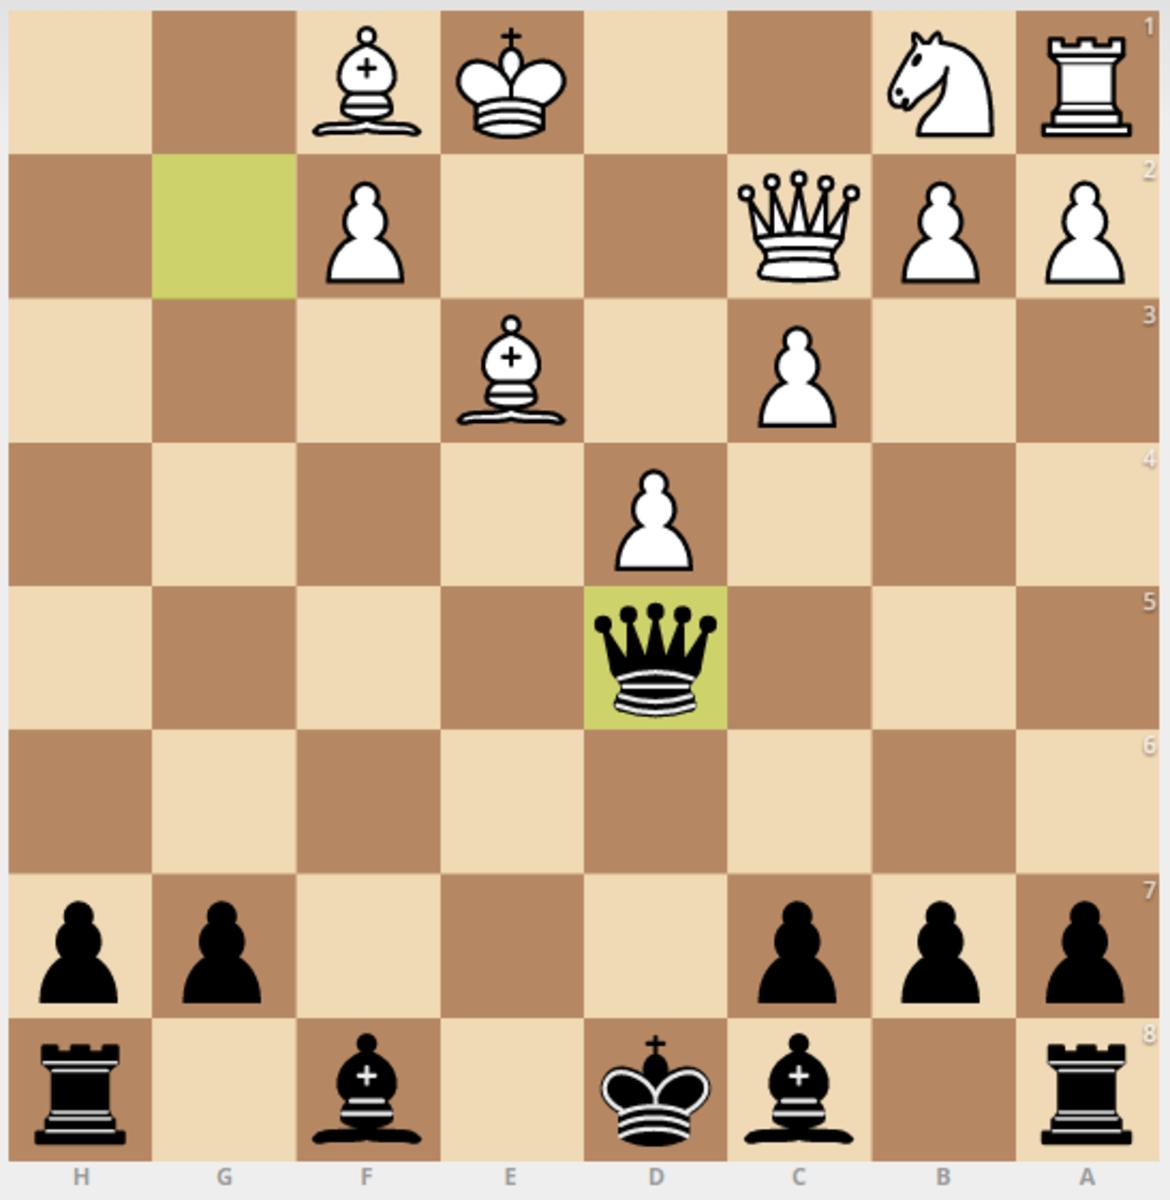 Bxf7 line ending after 6. Ng4